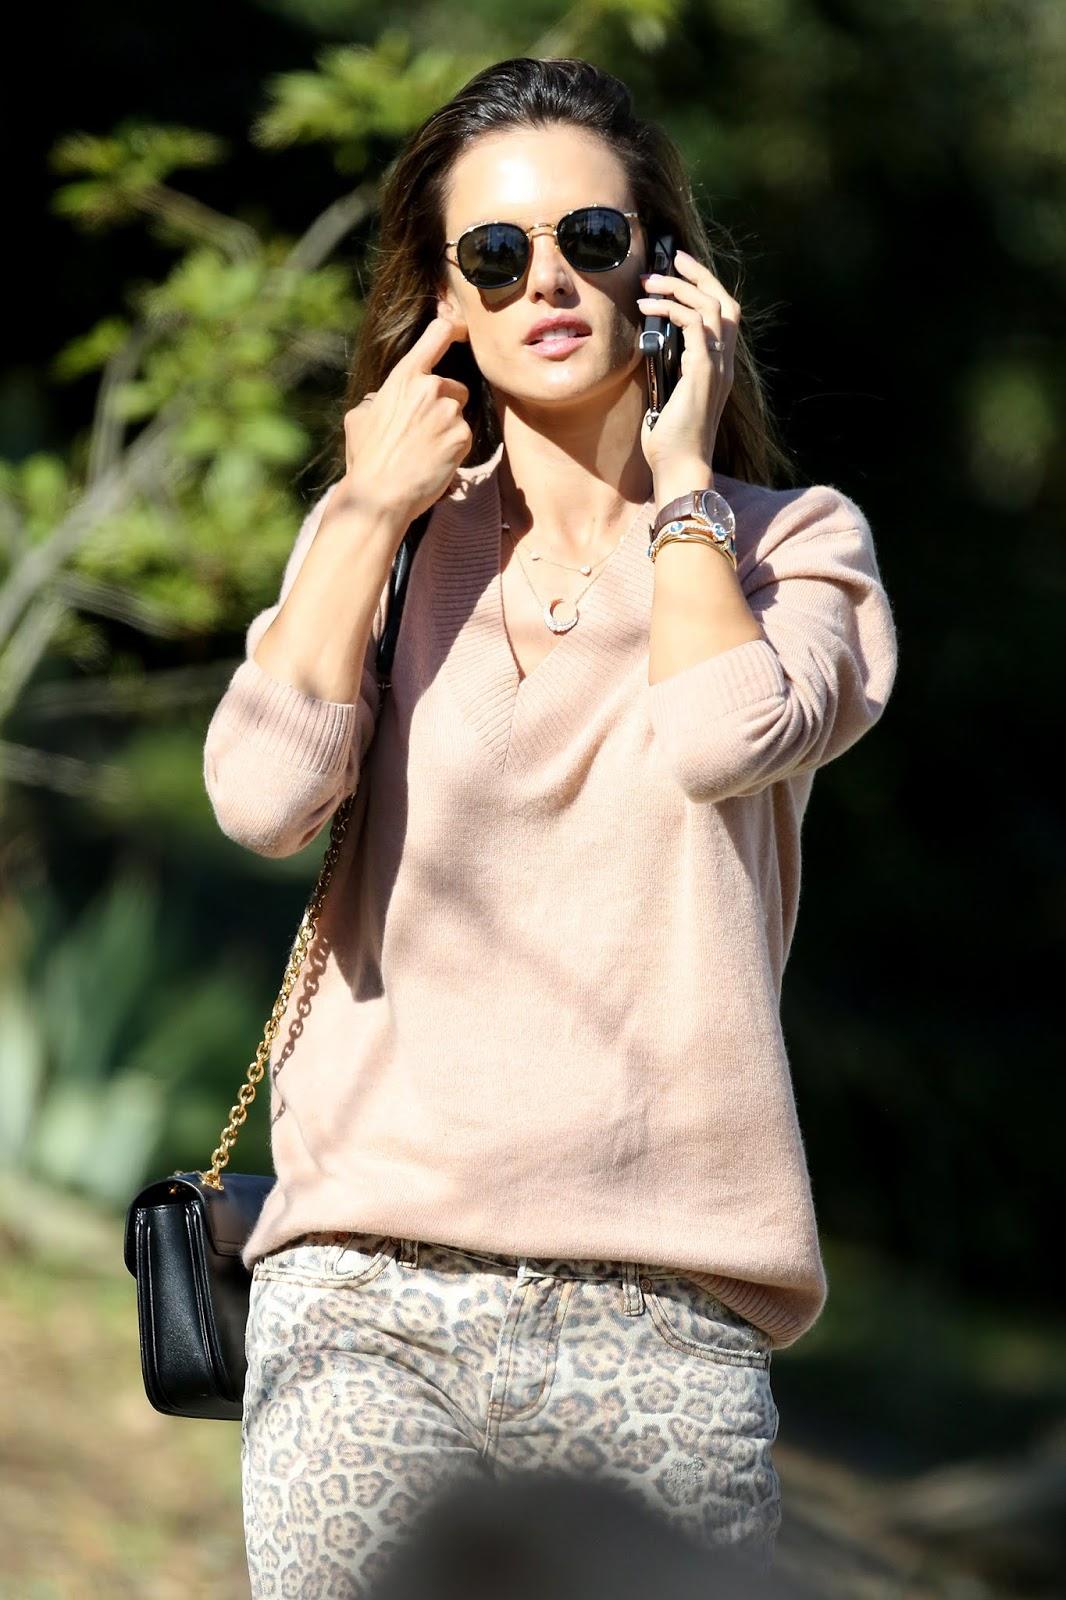 Alessandra Ambrosio talking on the phone in LA - 02/07/2019